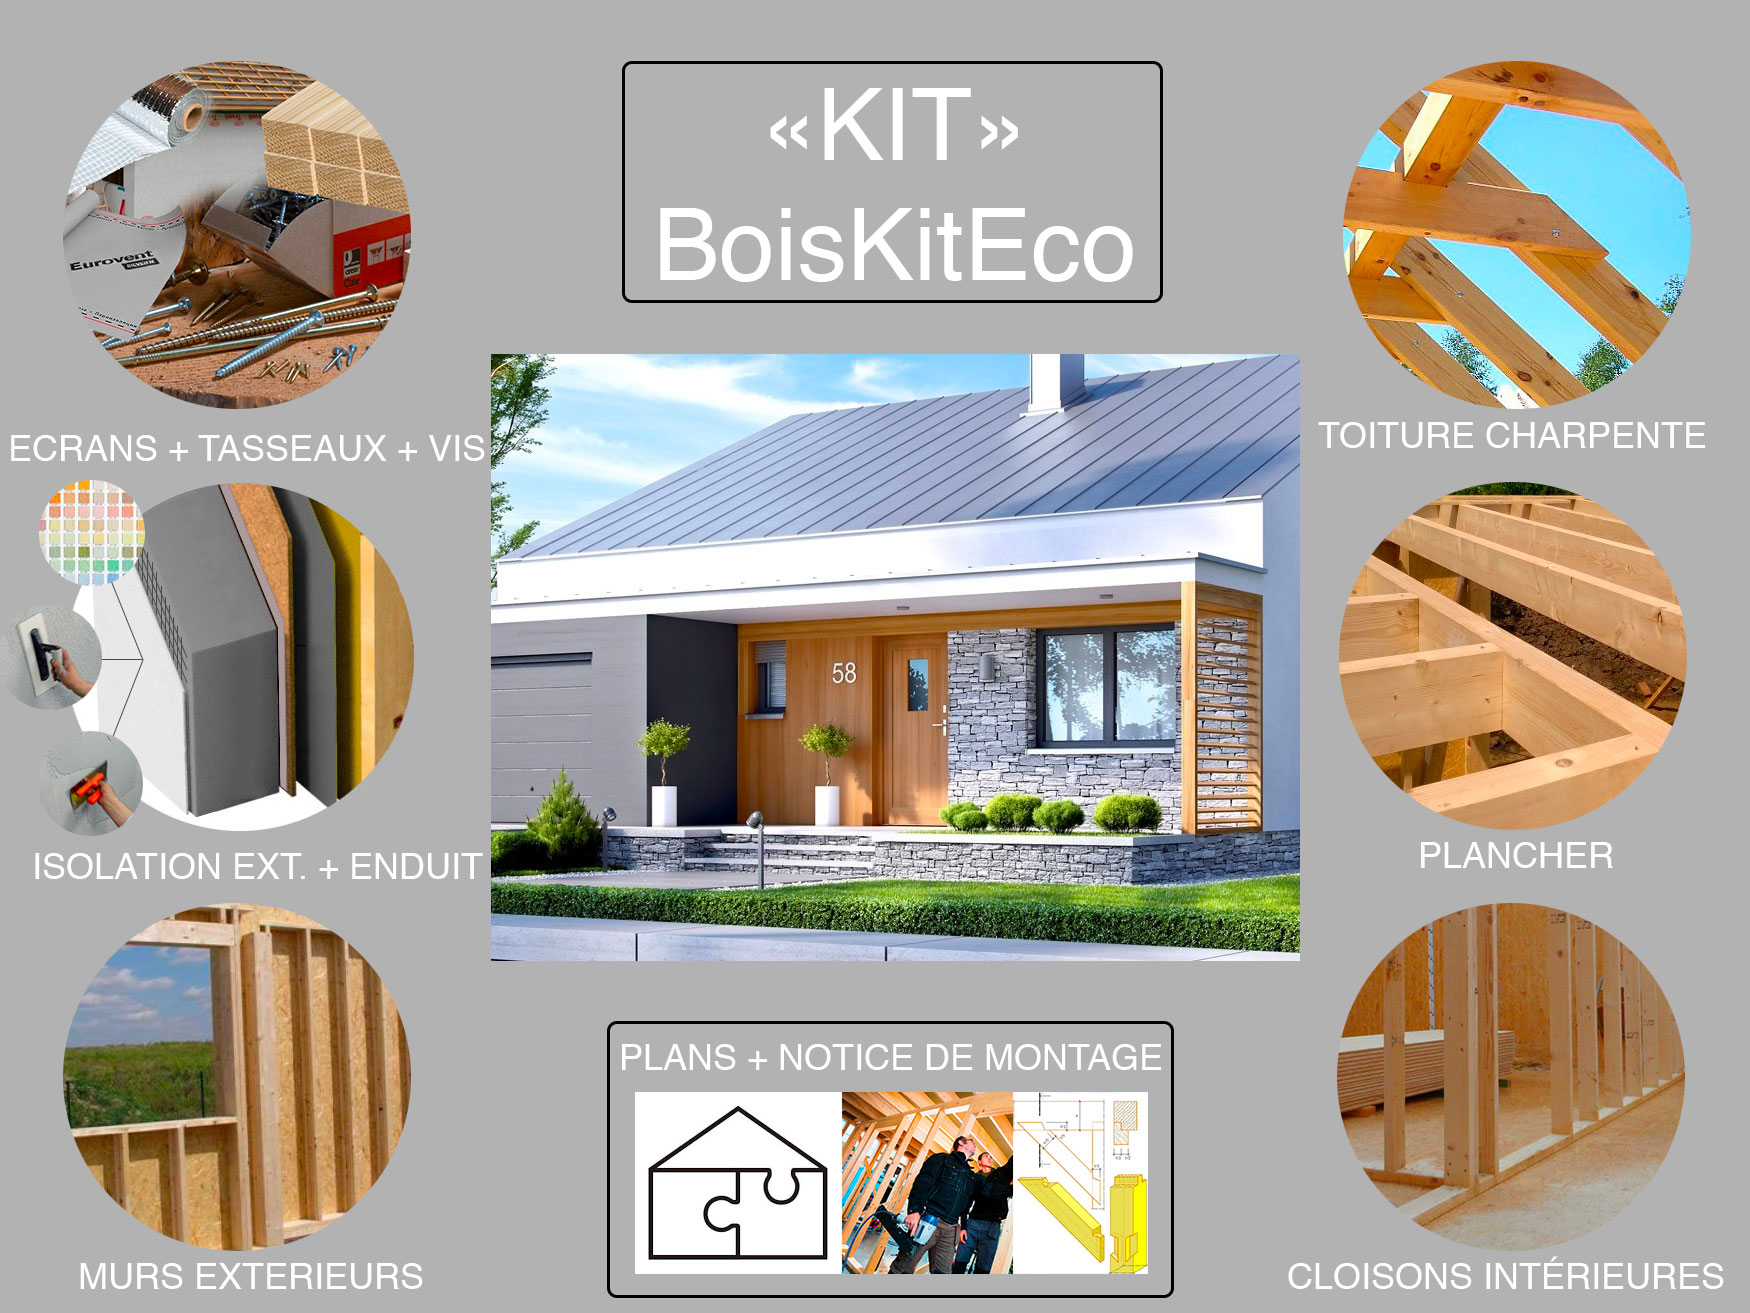 montage kit ossature bois RALF II G1